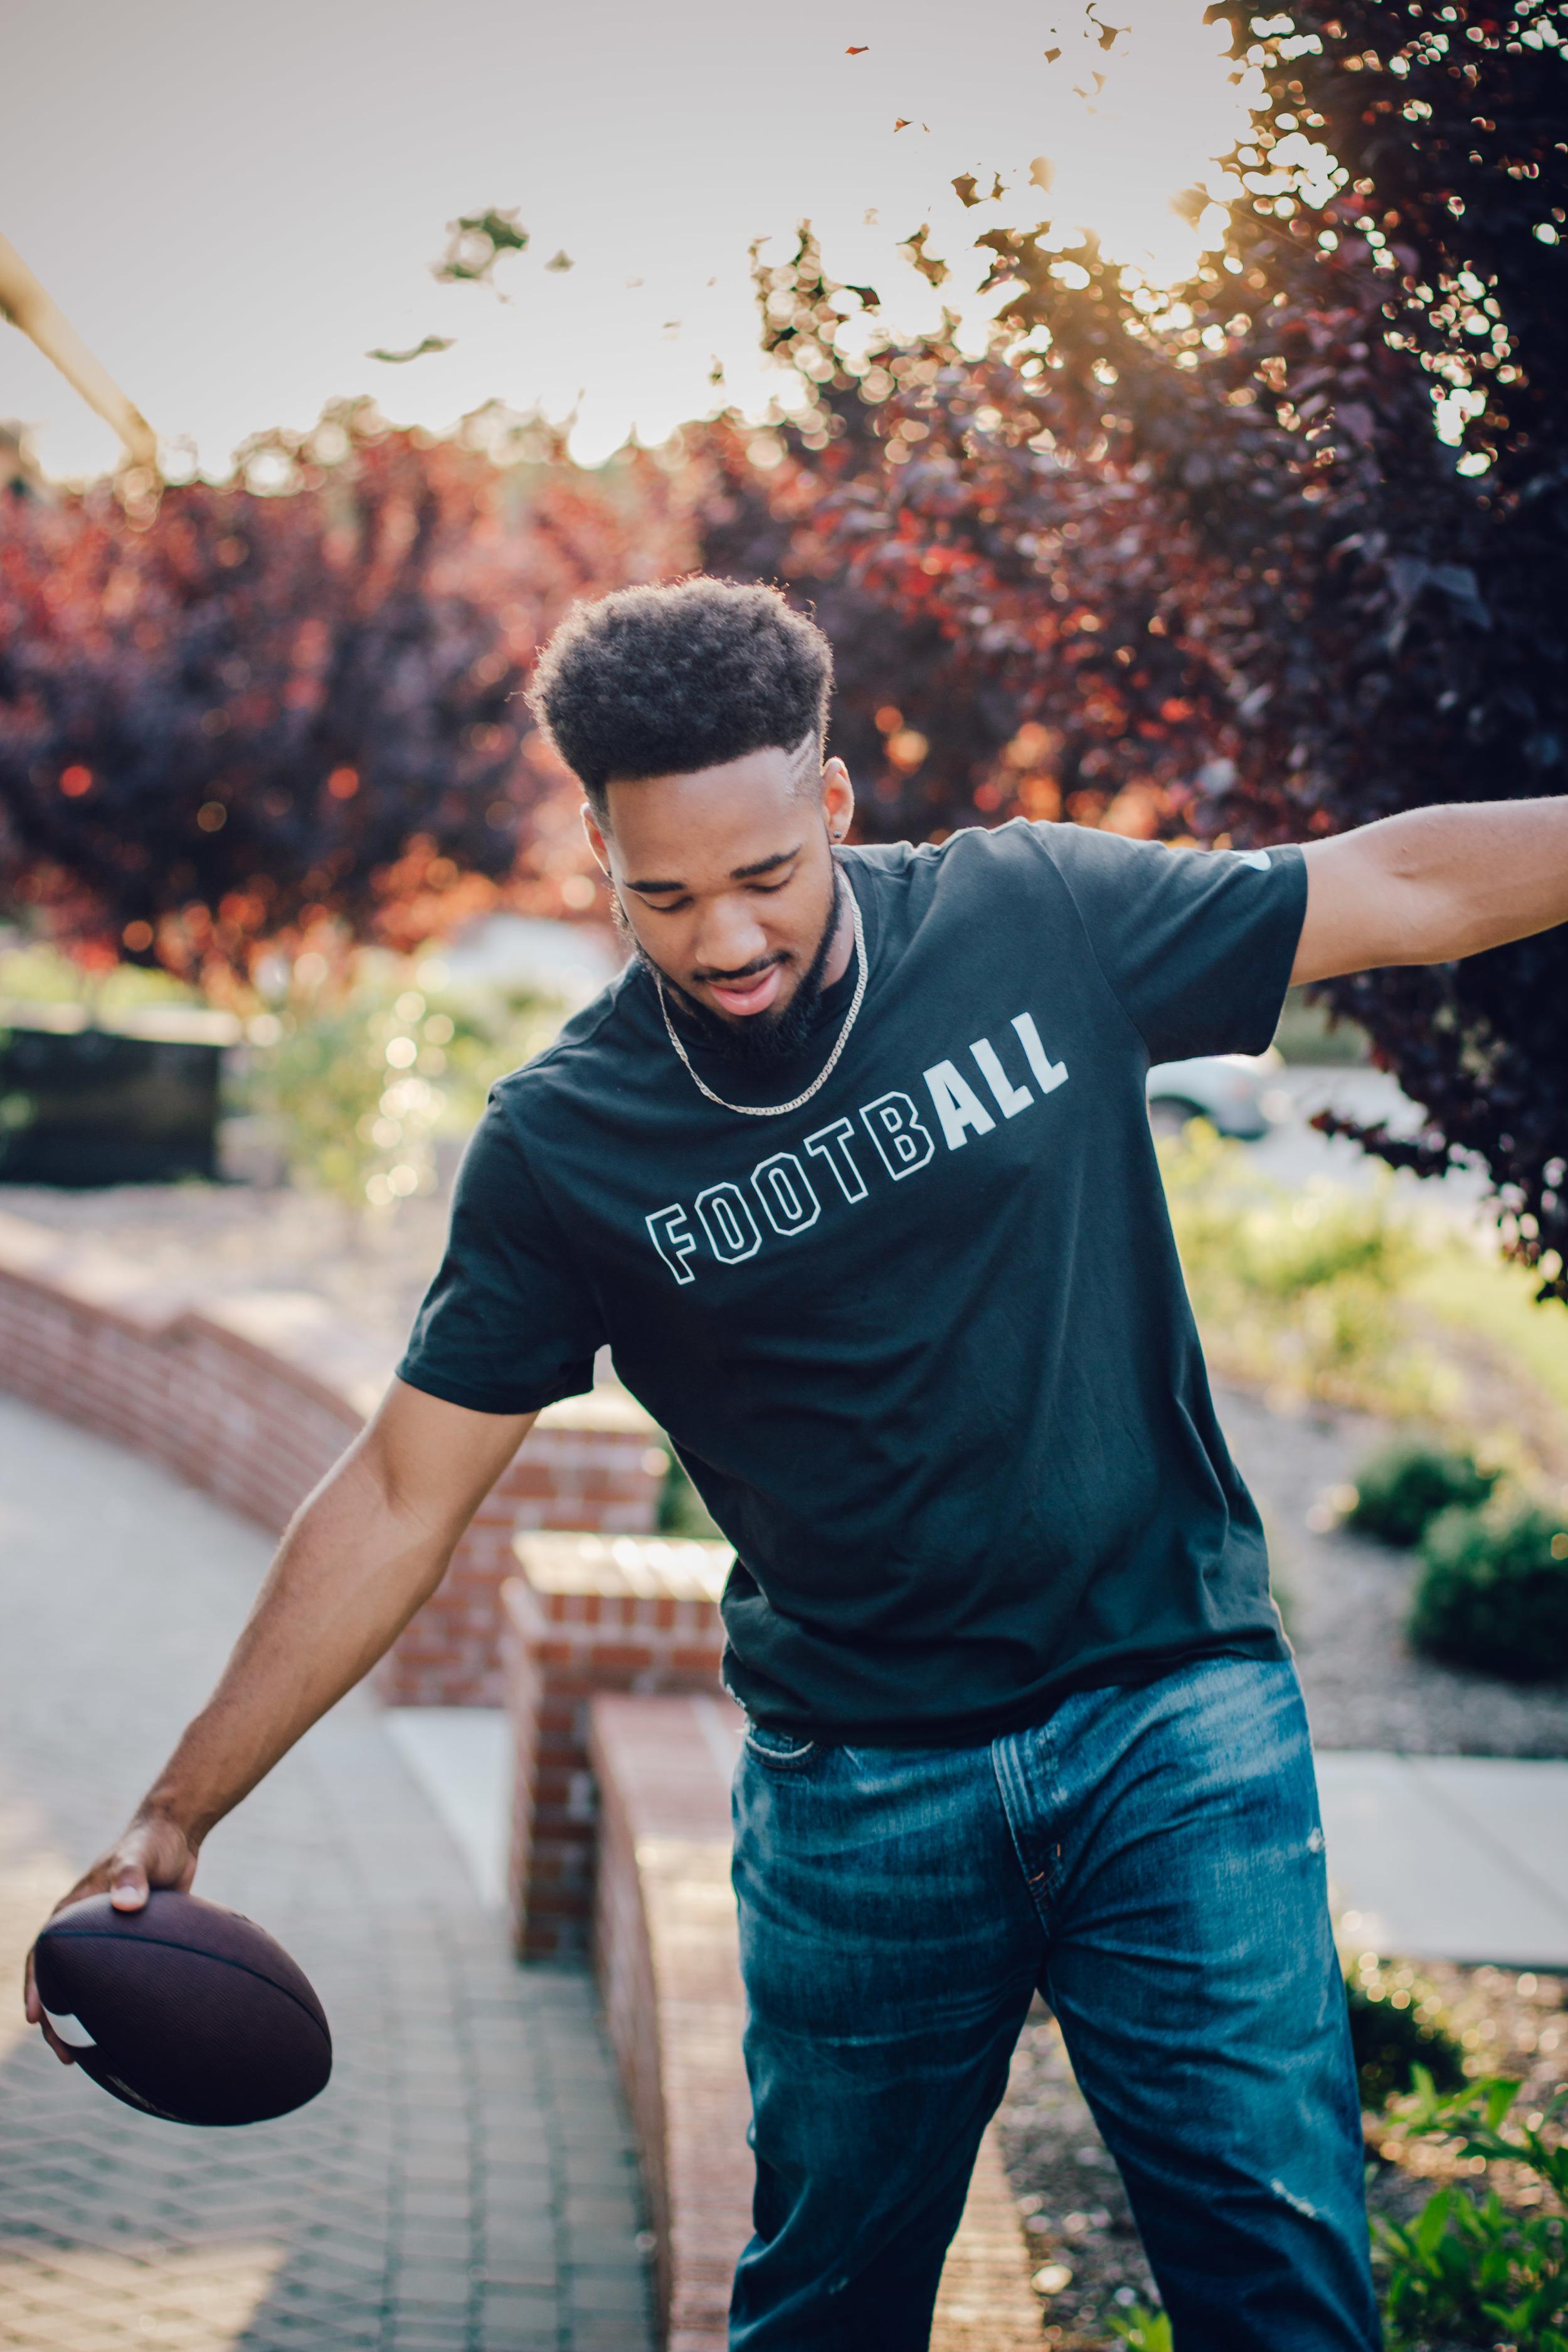 Chris E | Farmville Central High School Class of 2017 | Greenville NC Senior Portrait Photographer | Bryant Tyson Photography | www.memoriesbybryant.com